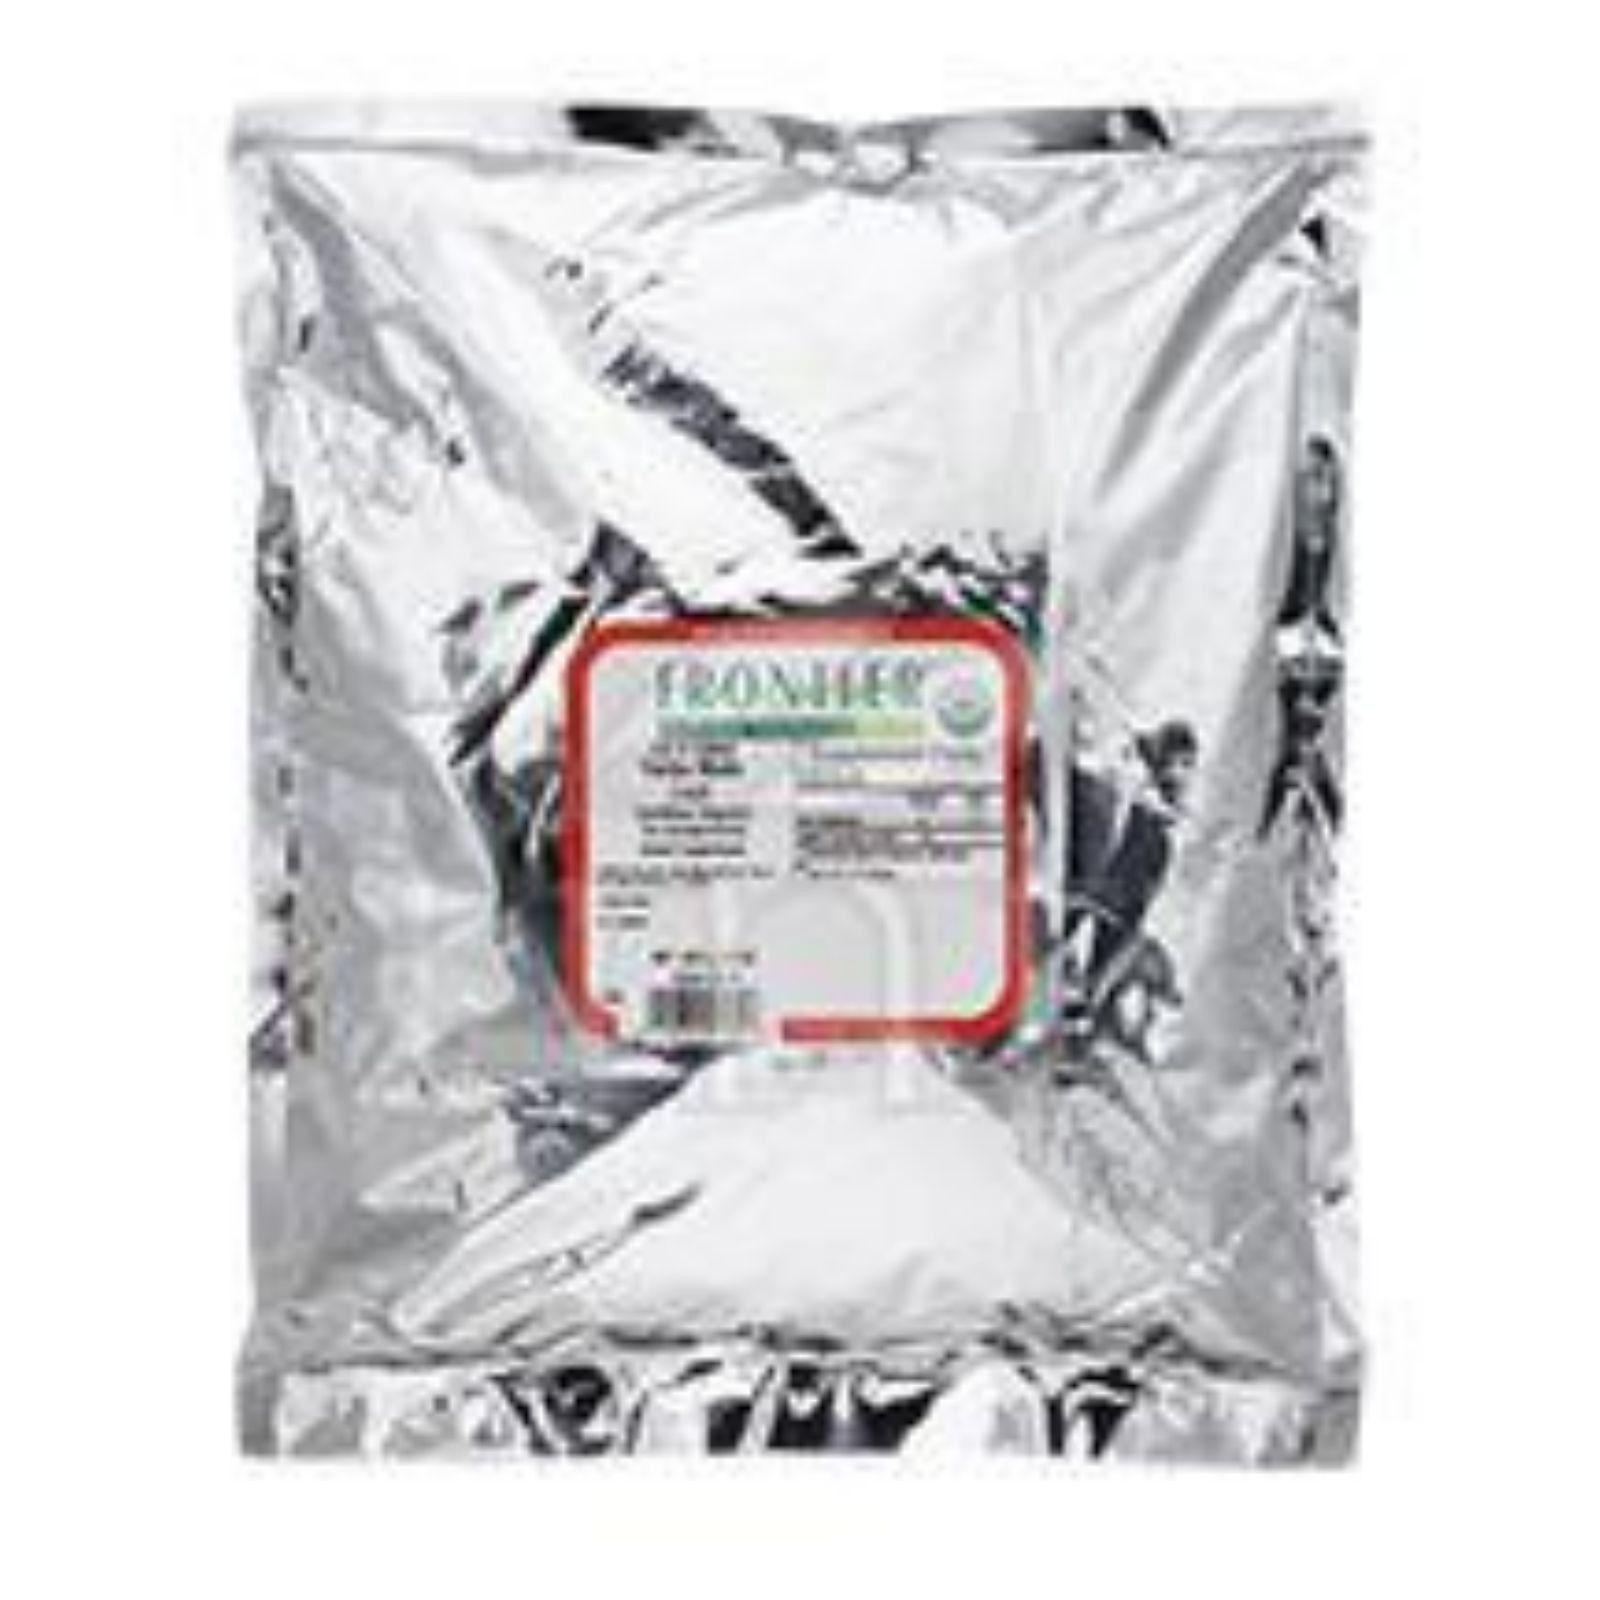 Bulk herbs spices organic organic herbal tea - Frontier Herb Yerba Mate Leaf Organic Cut And Sifted Bulk 1 Lb